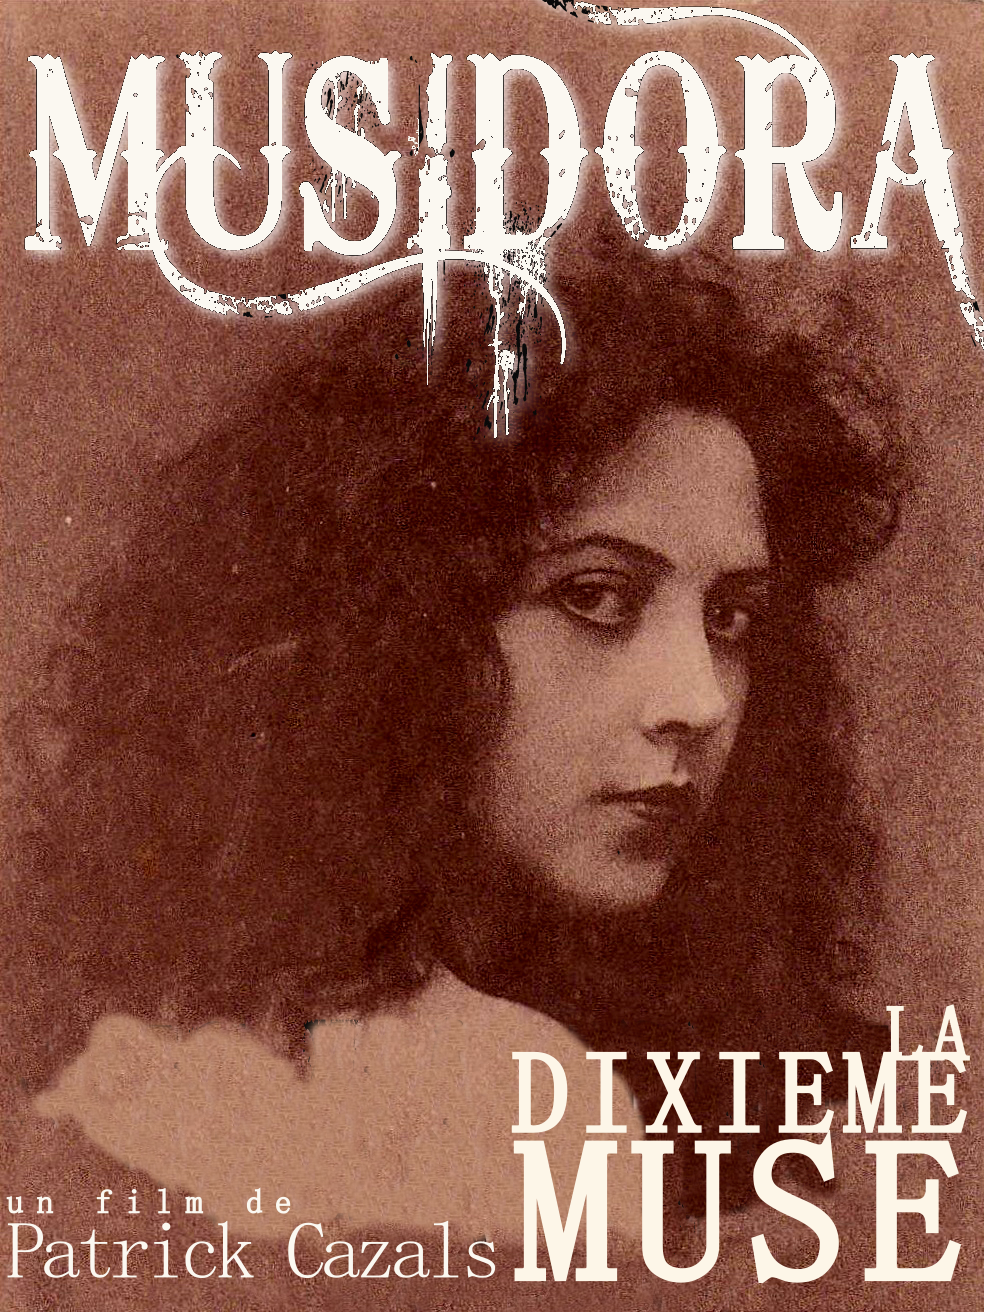 Musidora, la dixième muse